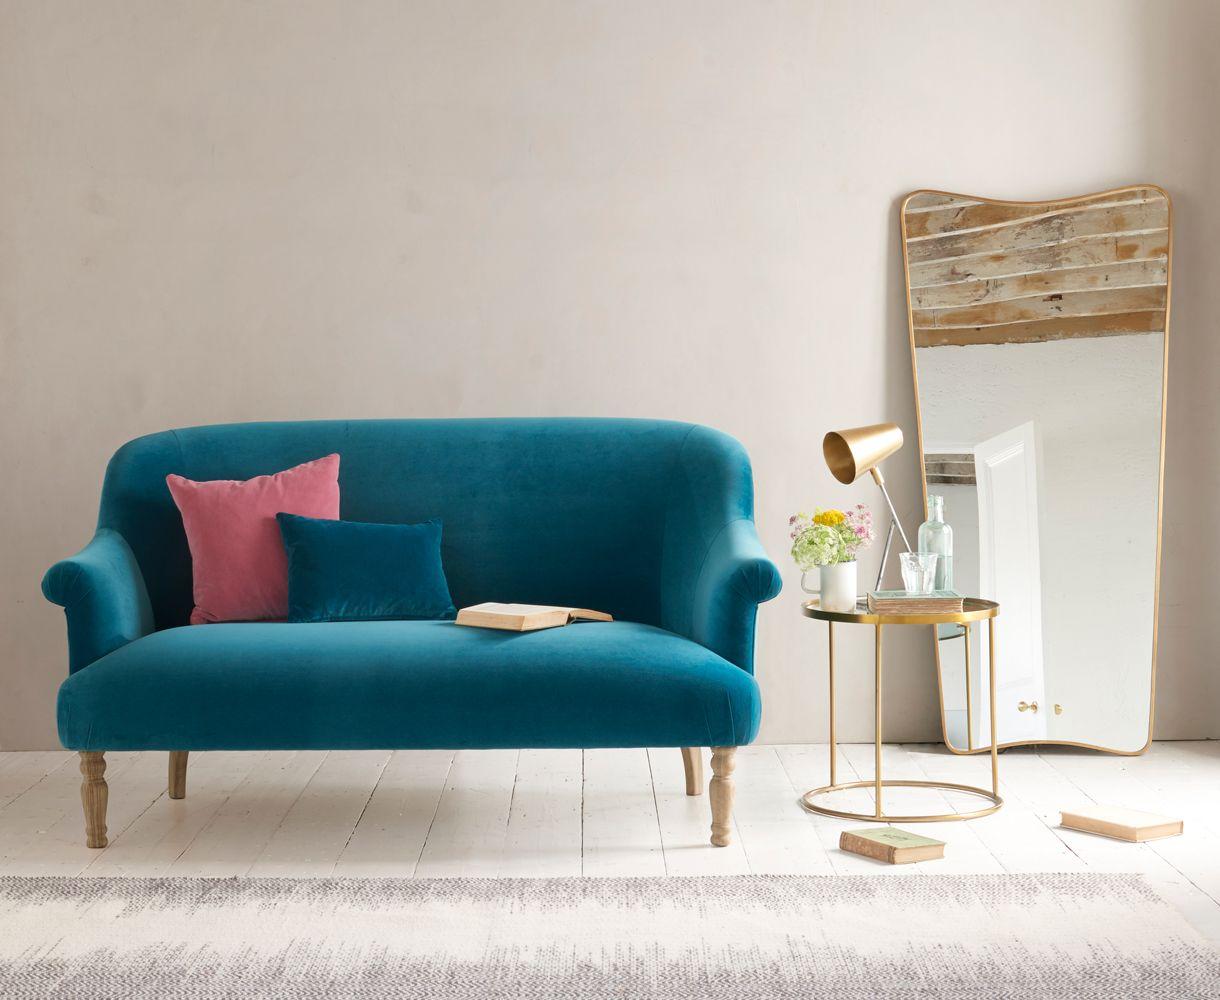 Fine Sweetie Sofa Home Small Sofa Retro Sofa Teal Living Rooms Theyellowbook Wood Chair Design Ideas Theyellowbookinfo